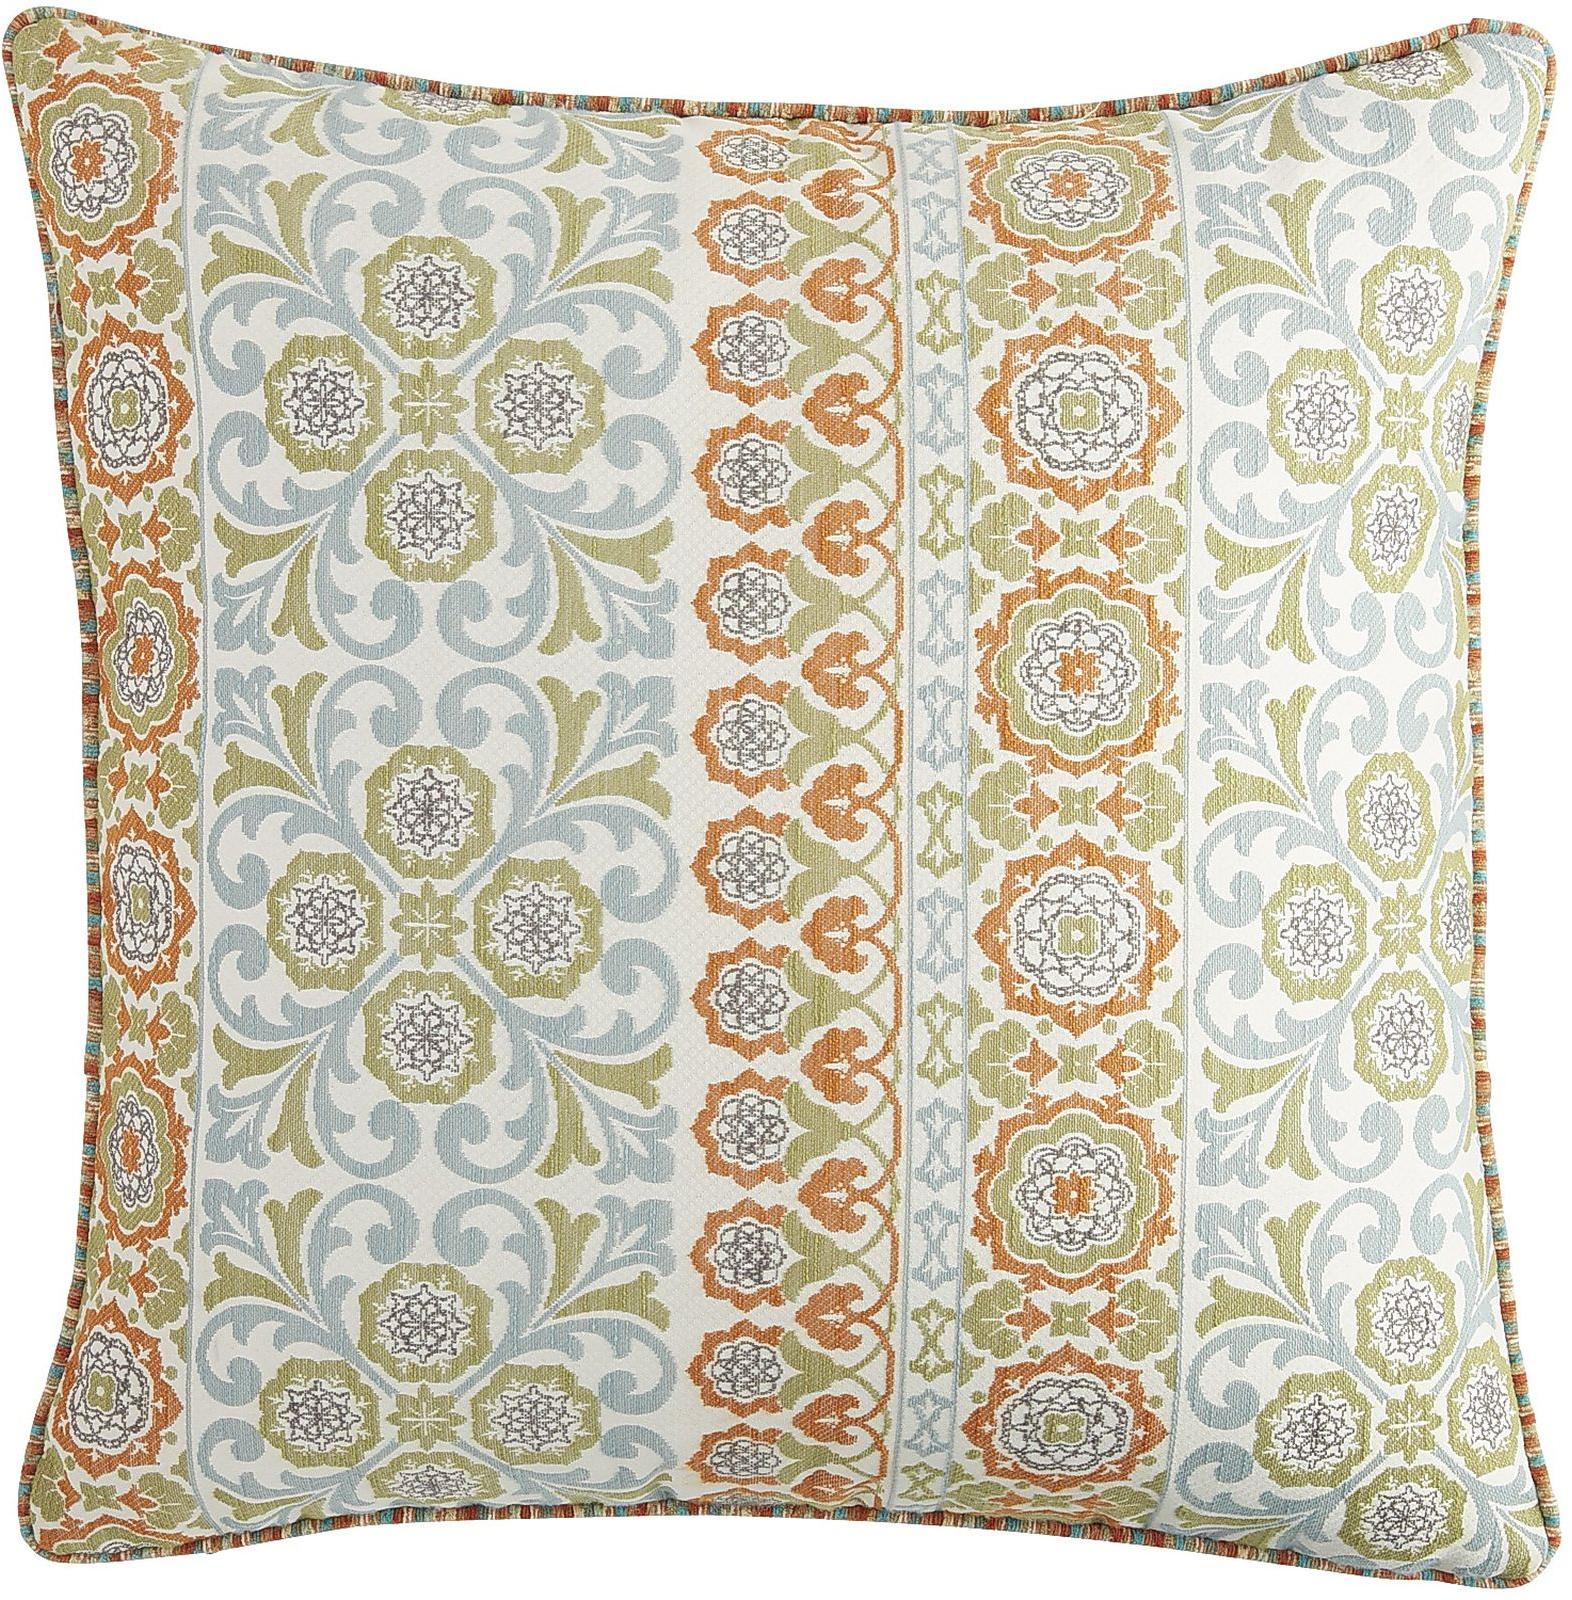 Oversized Capri Tile Pillow - Multi | Pier 1 Imports